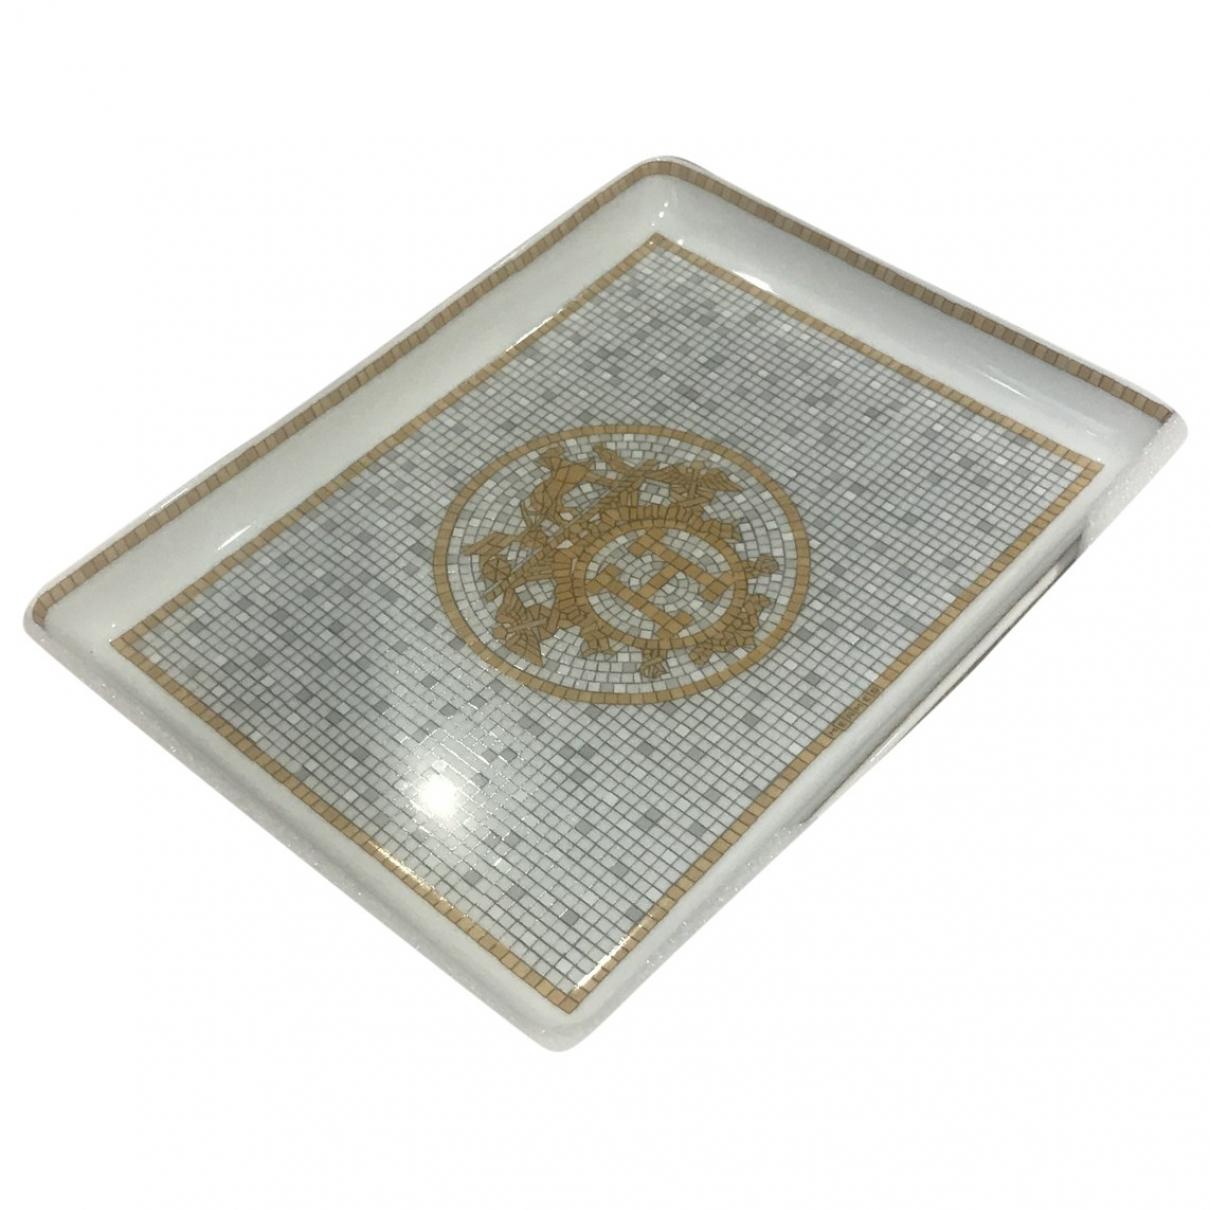 Hermès Mosaïque au 24 Gold Ceramic Dinnerware for Life & Living \N